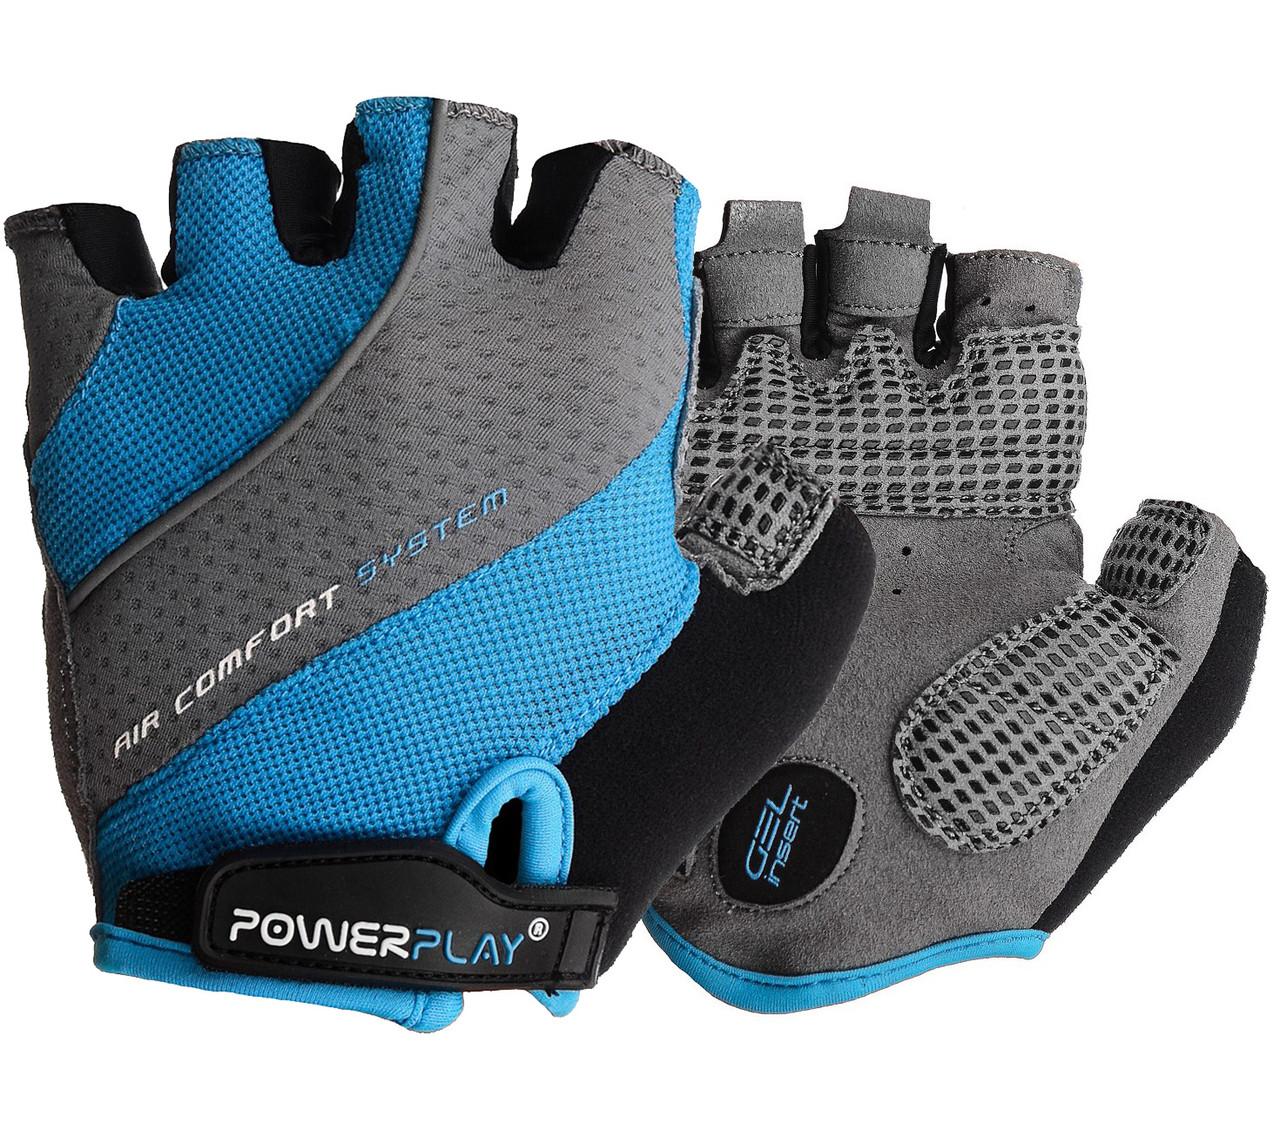 Велорукавички PowerPlay 5023 Блакитні S